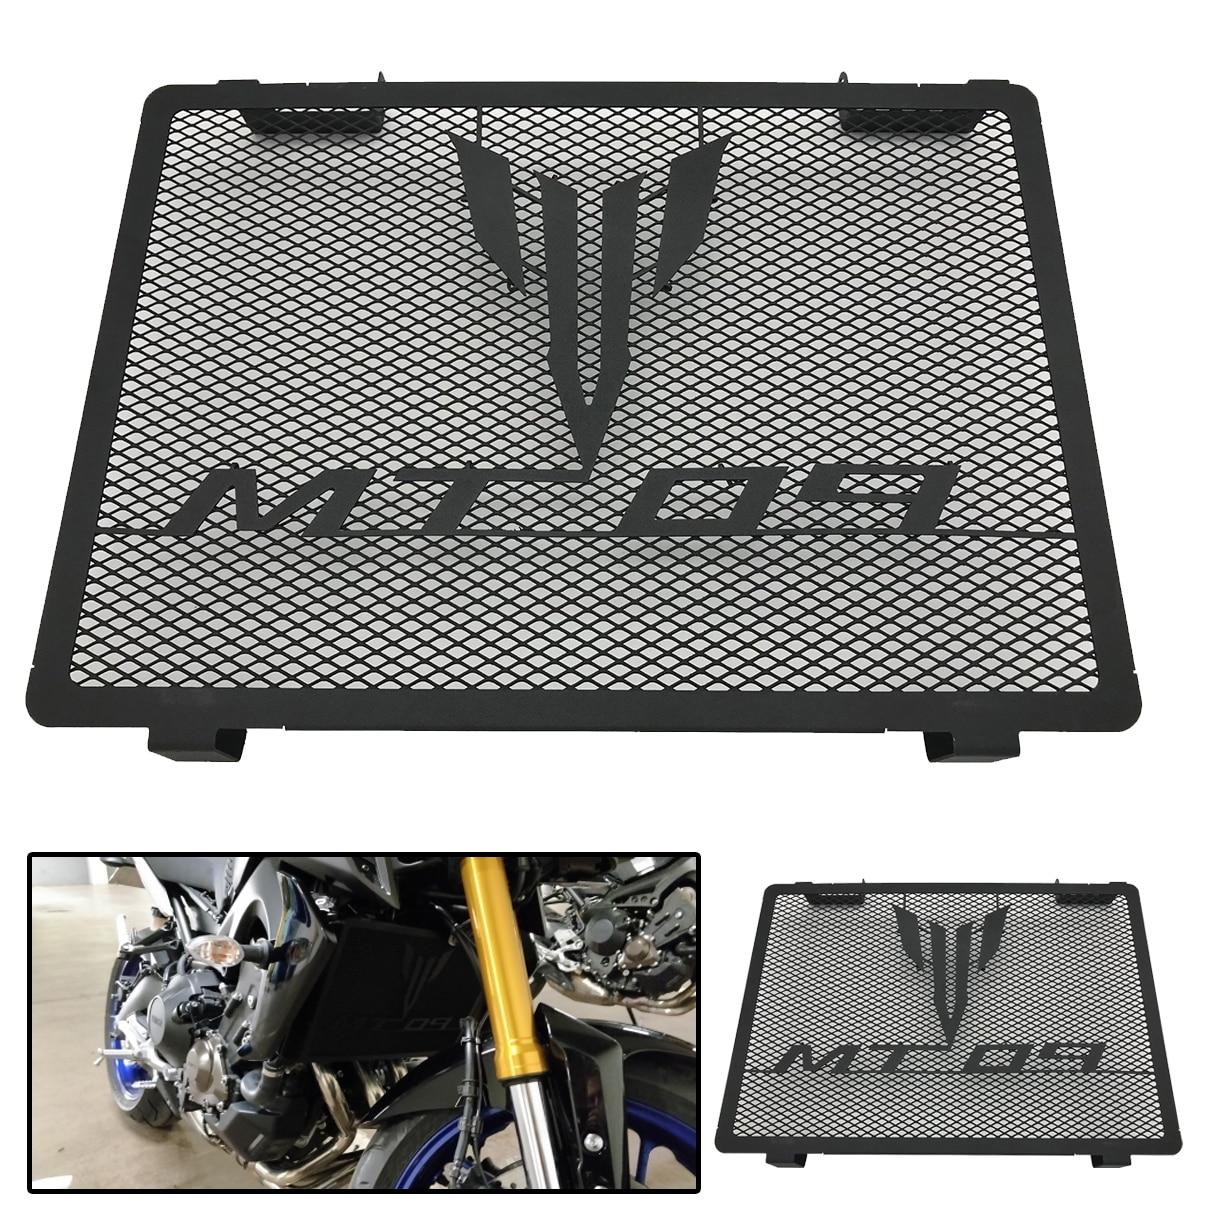 Motocicleta mt09 radiador guarda protetor grille grill capa protector para yamaha mt 09 fz09 fz 09 MT-09 tracer 2014-2018 2019 20